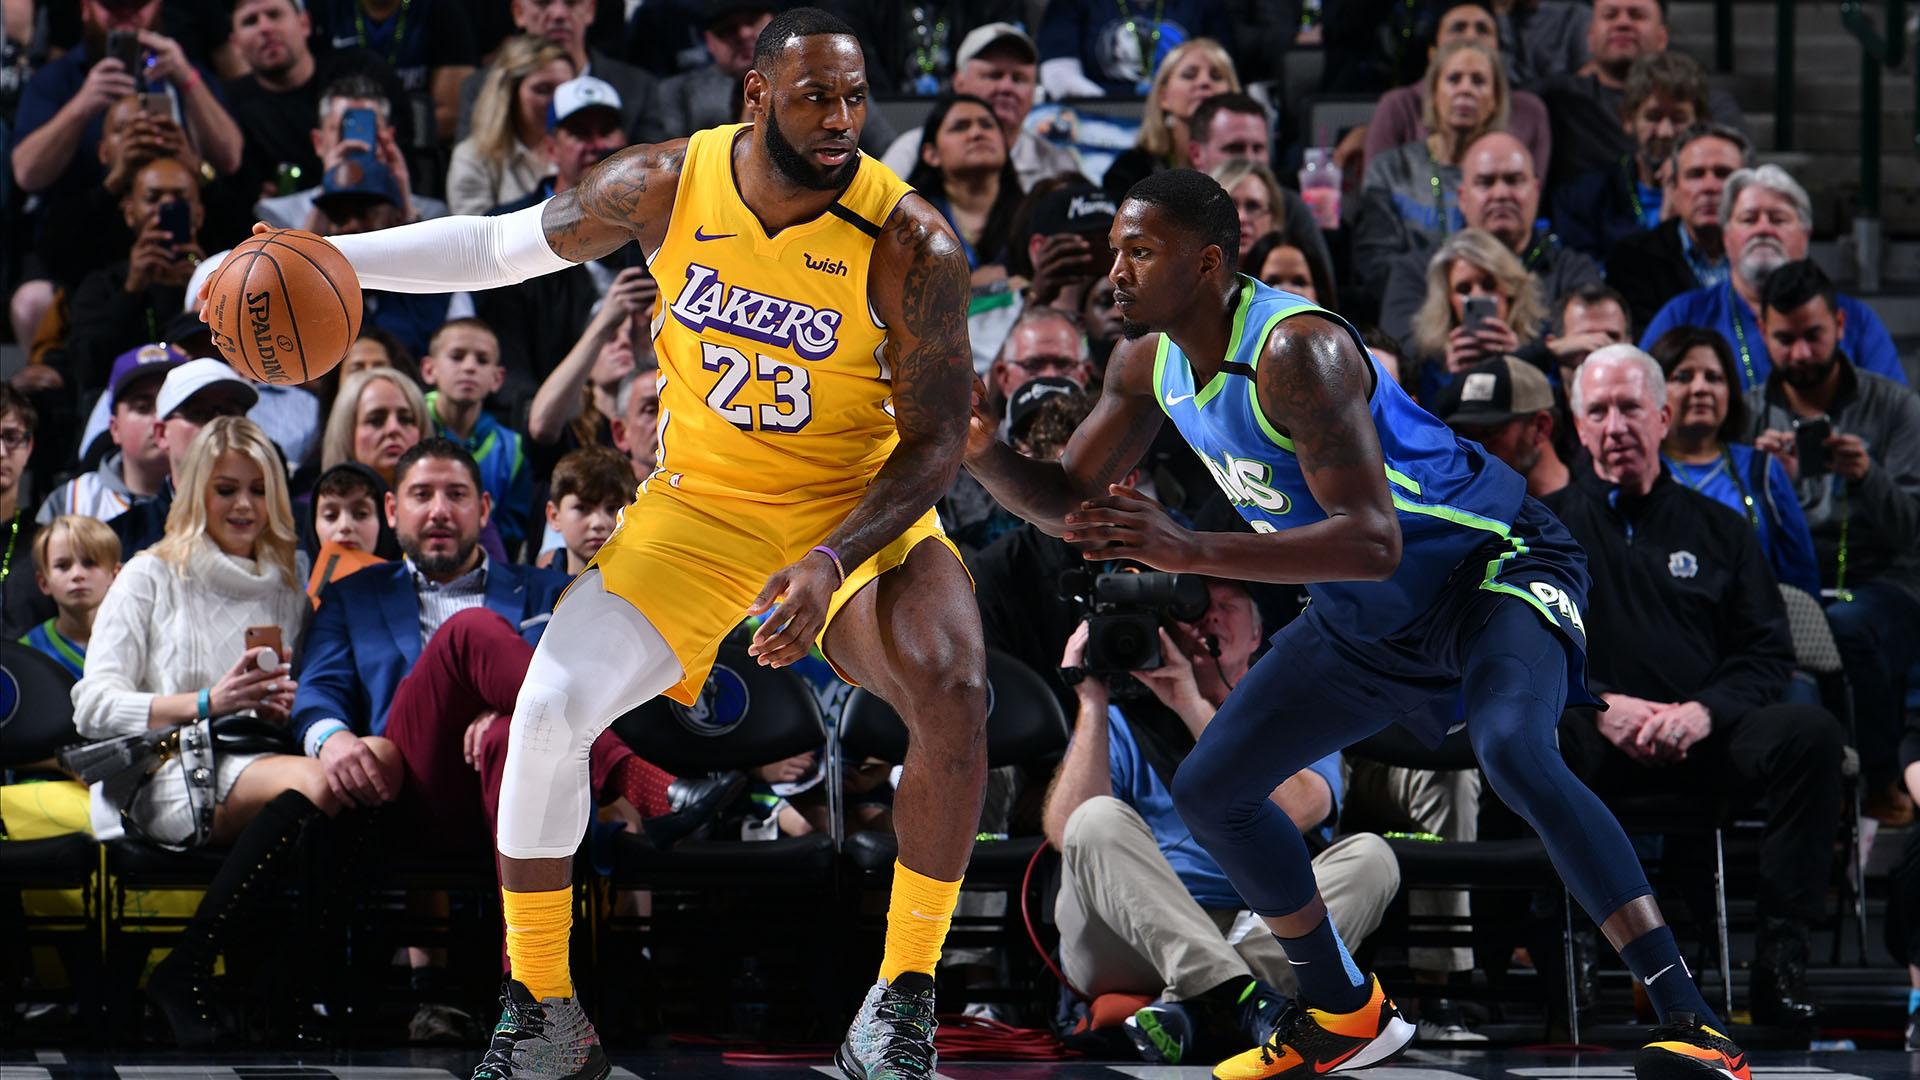 Lakers @ Mavericks